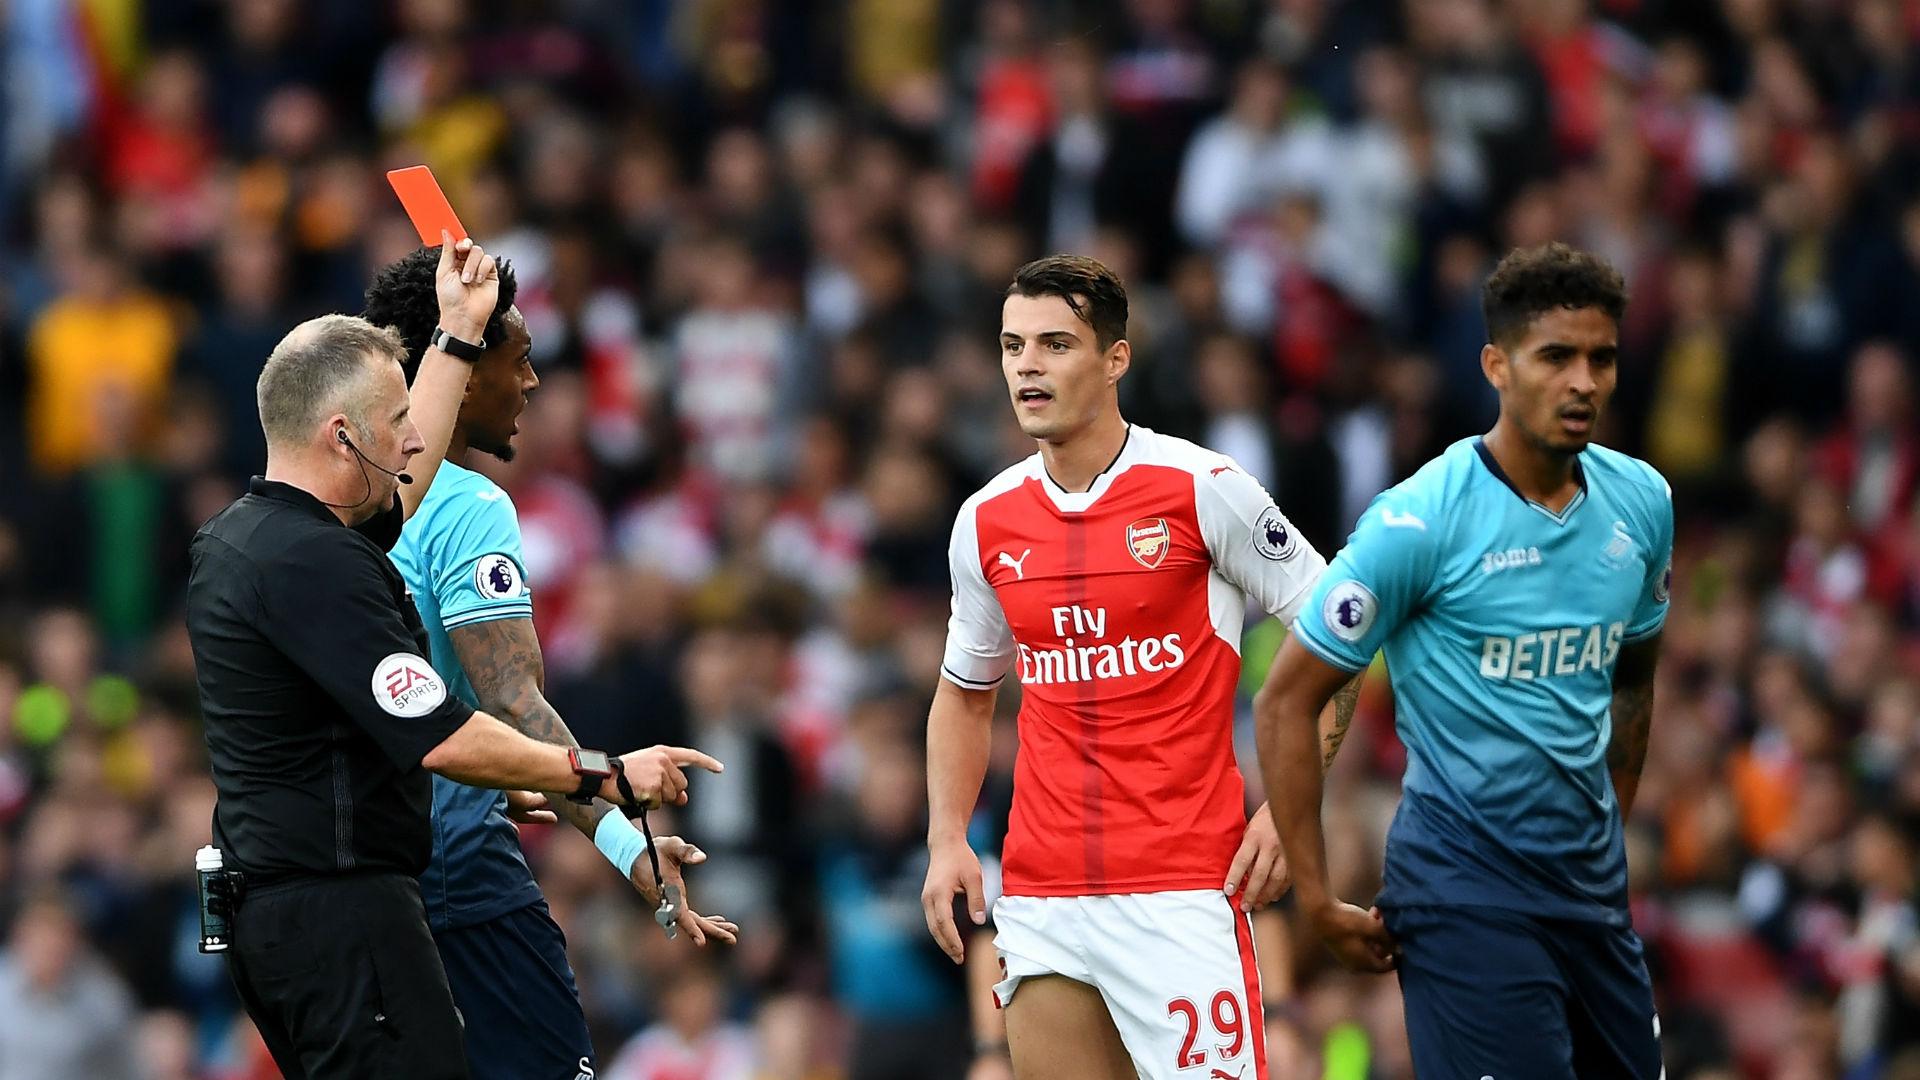 Arsene Wenger deserves more respect from Arsenal's 'impatient' fans, says Alex Iwobi